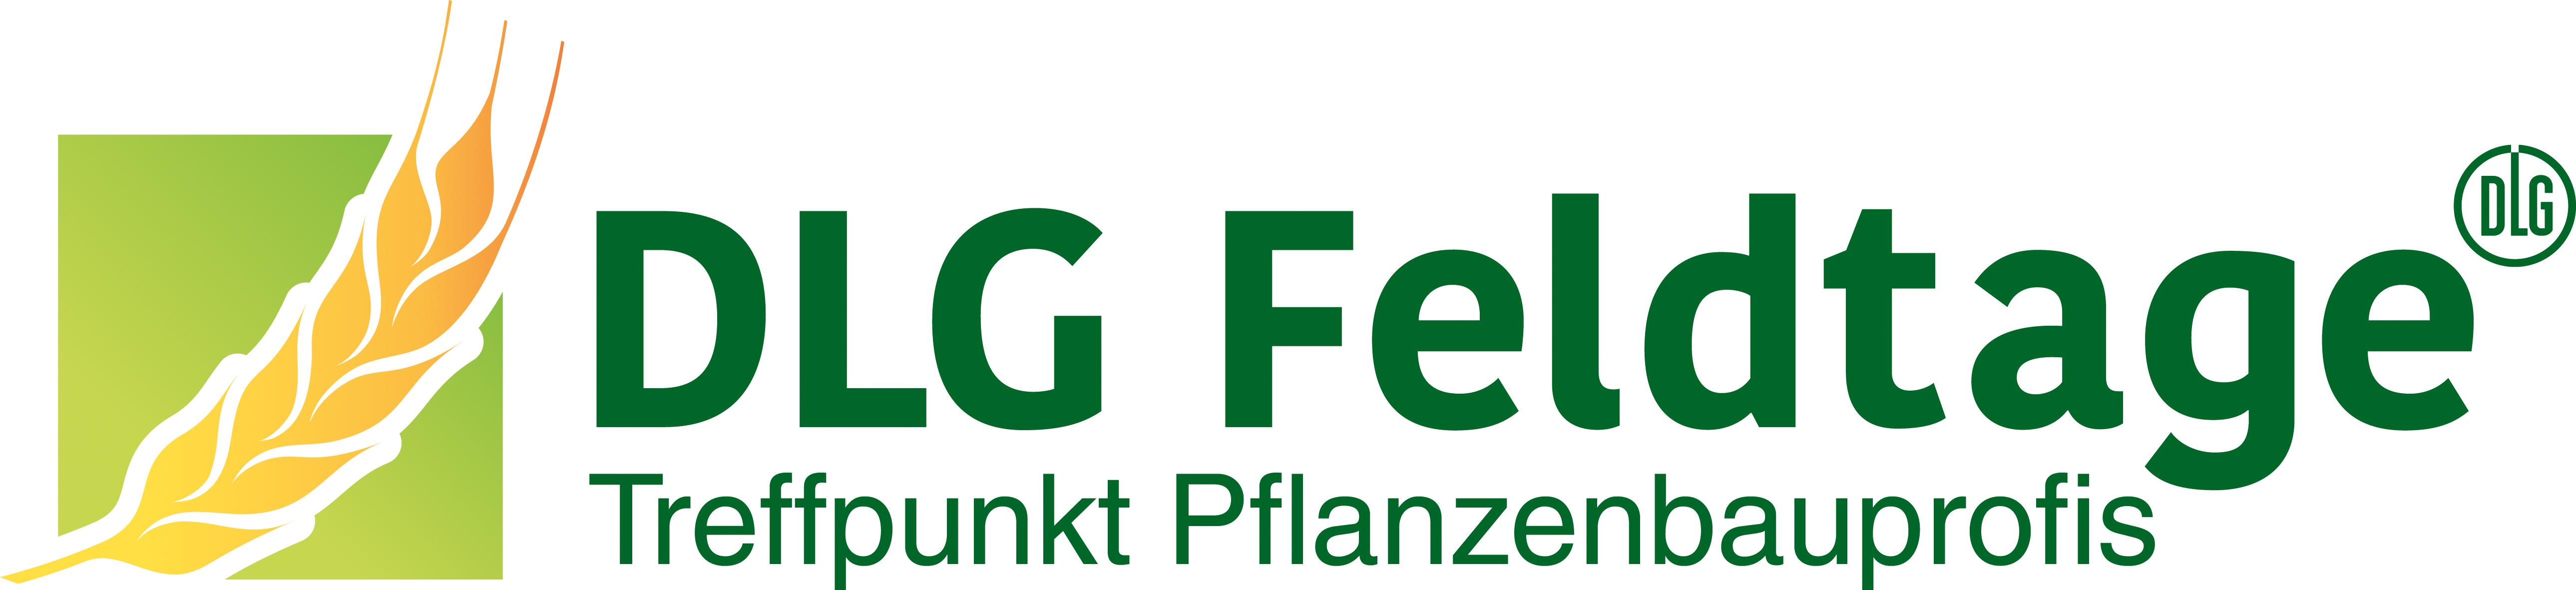 DLG_Feldtage_logo